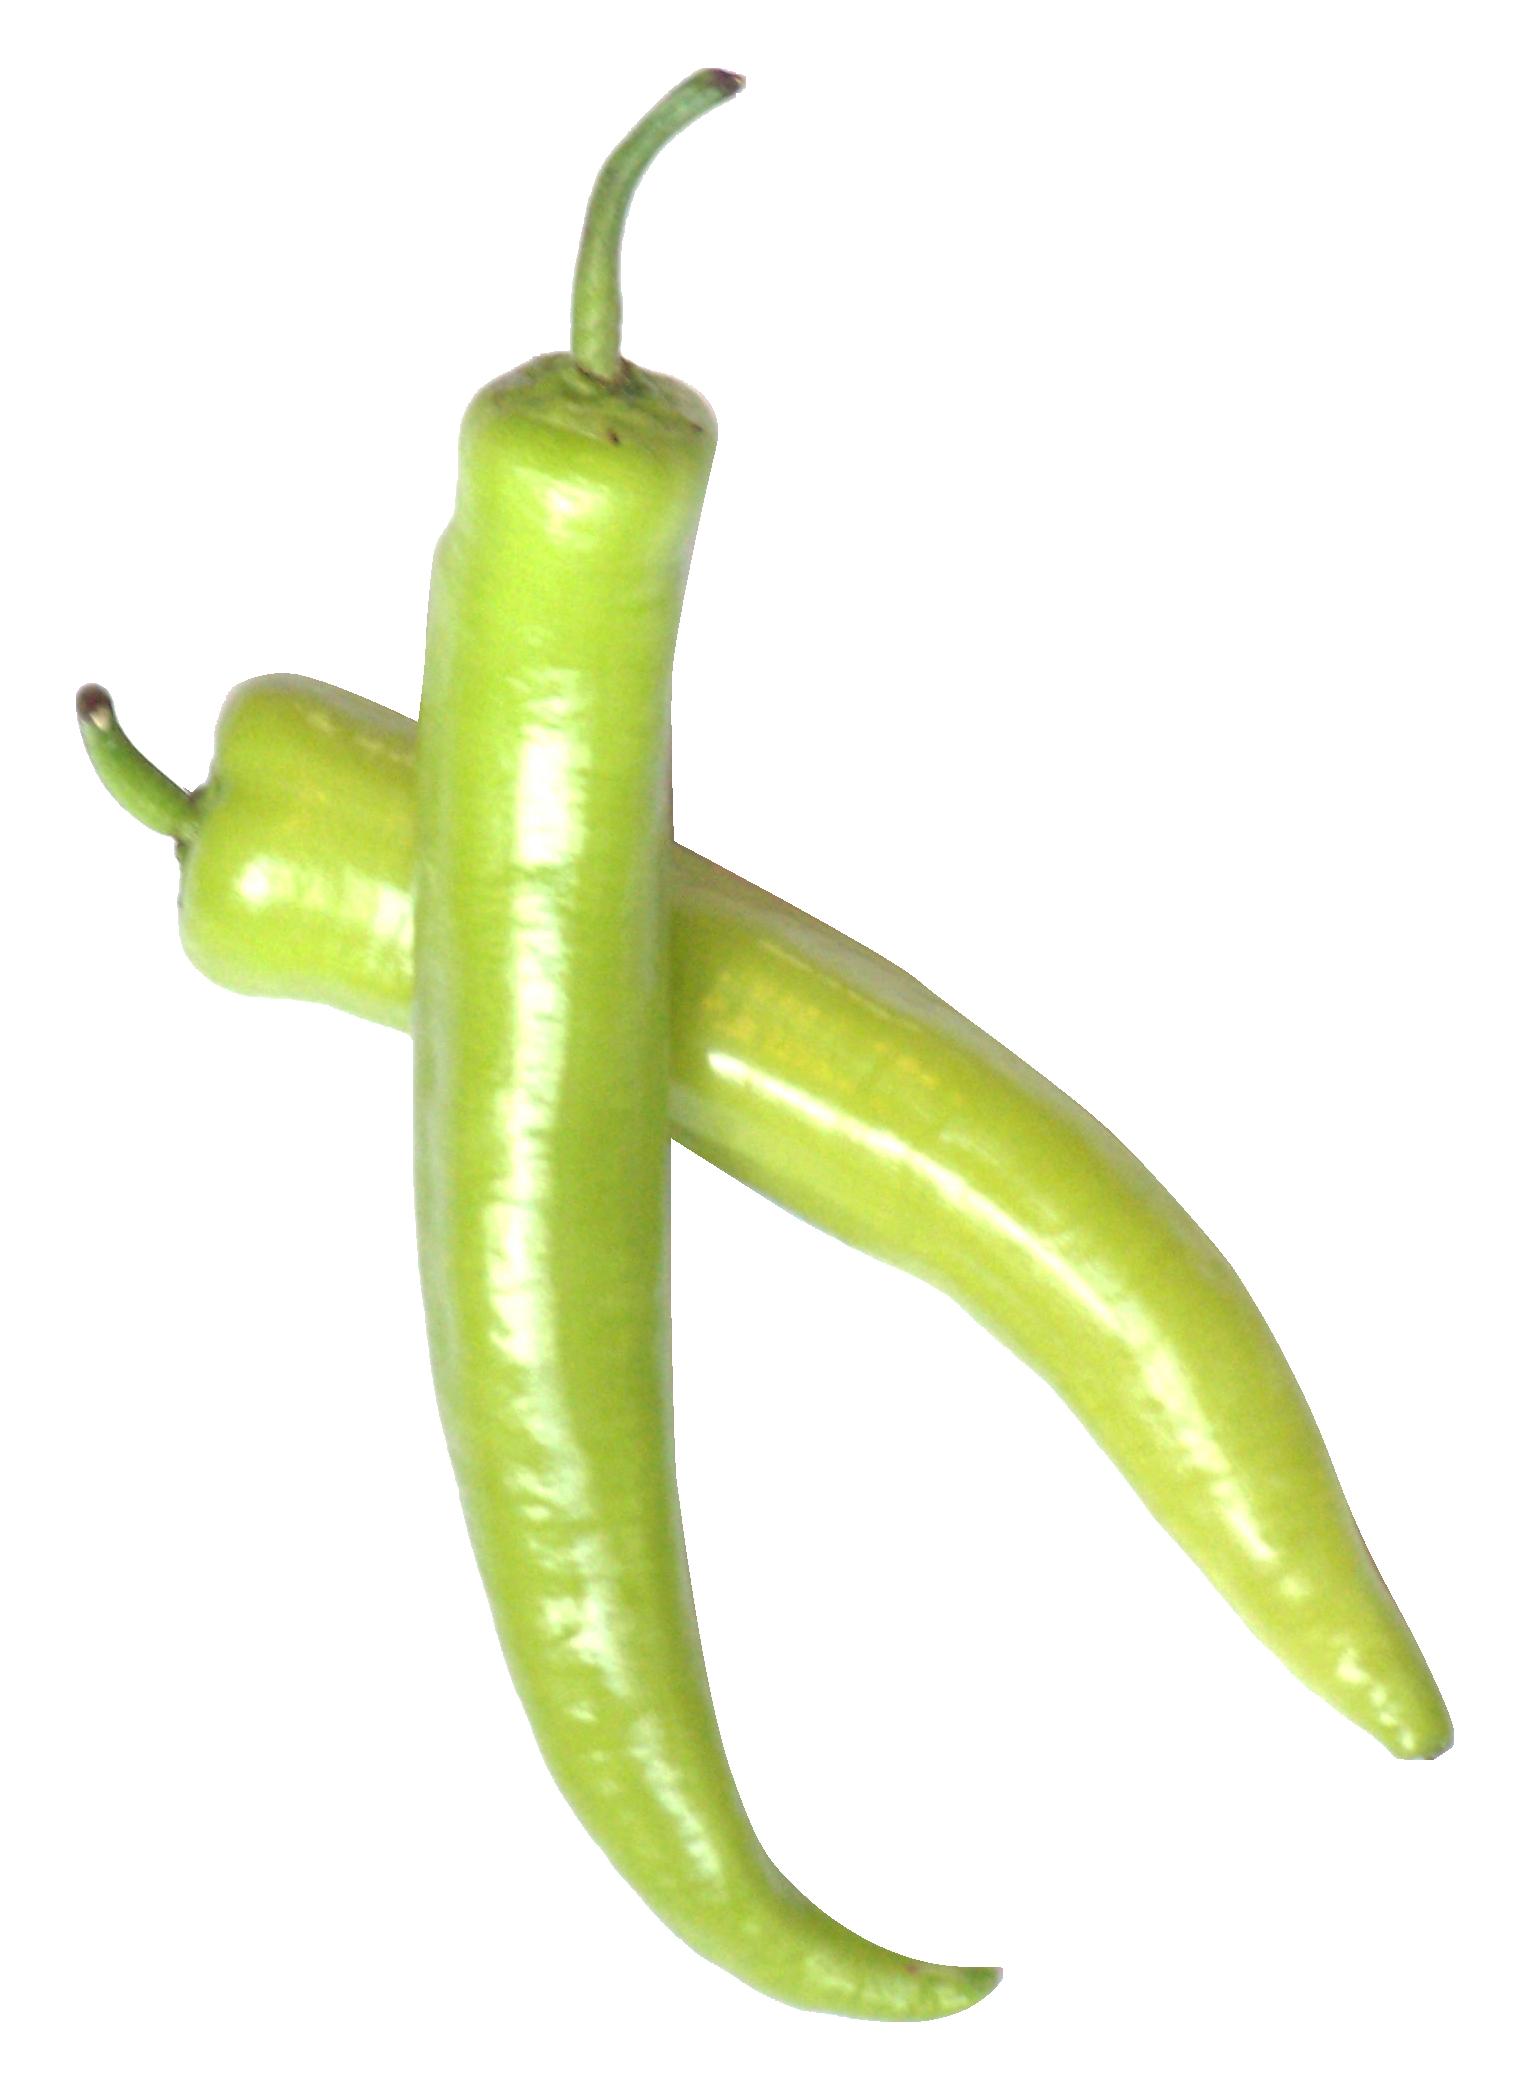 Jalapeno clipart serrano pepper. Green chili png image